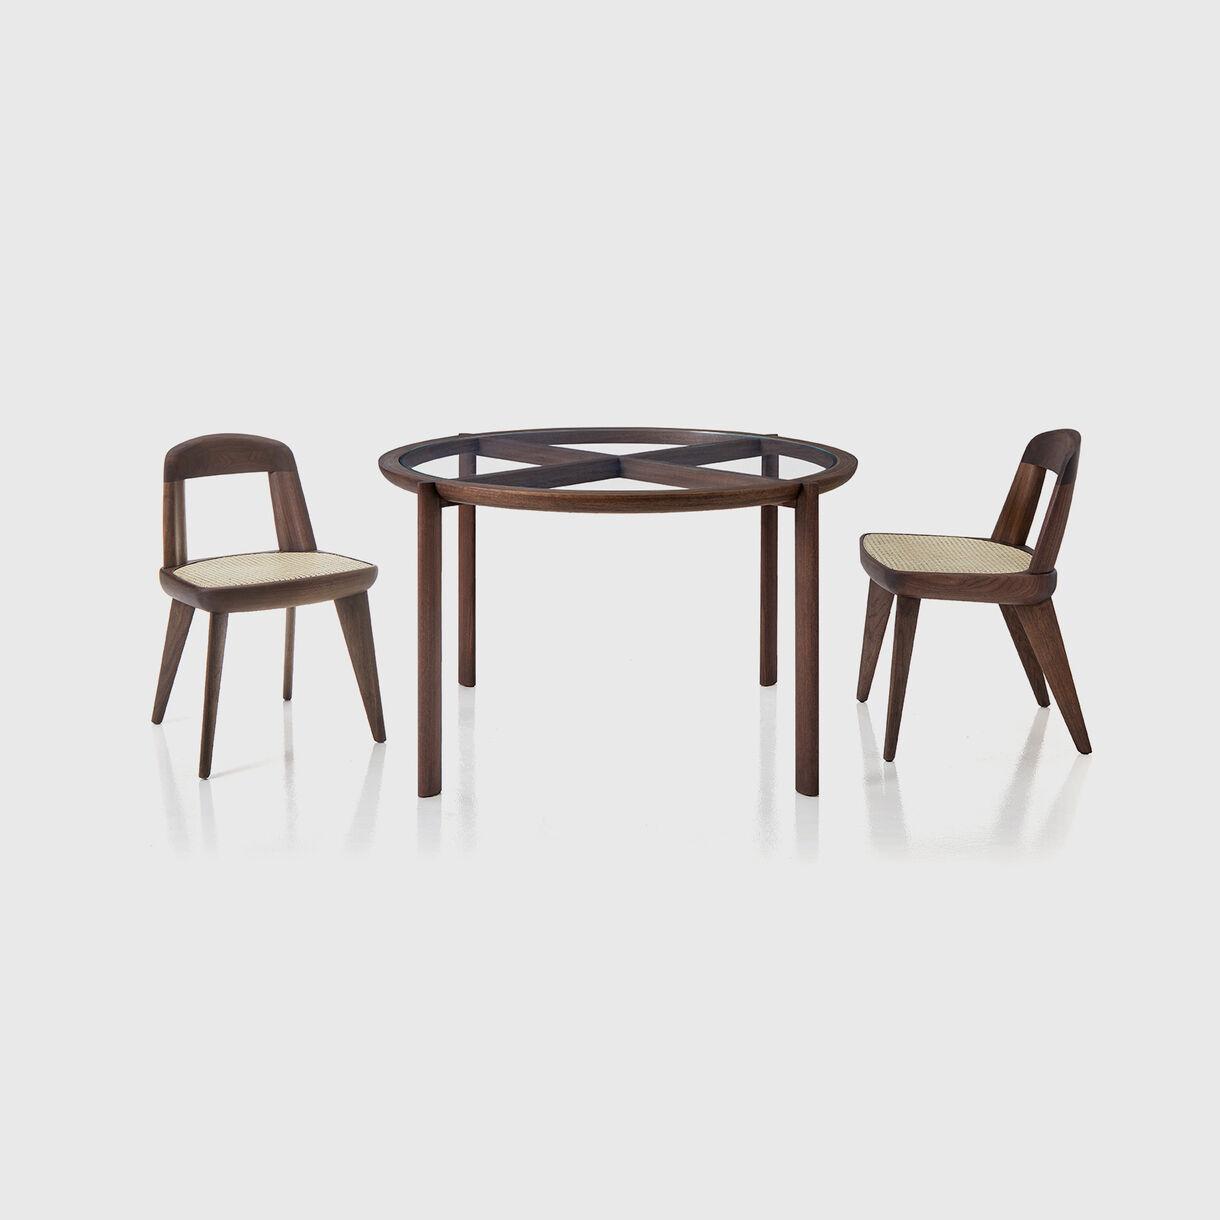 Spoke Dining Table